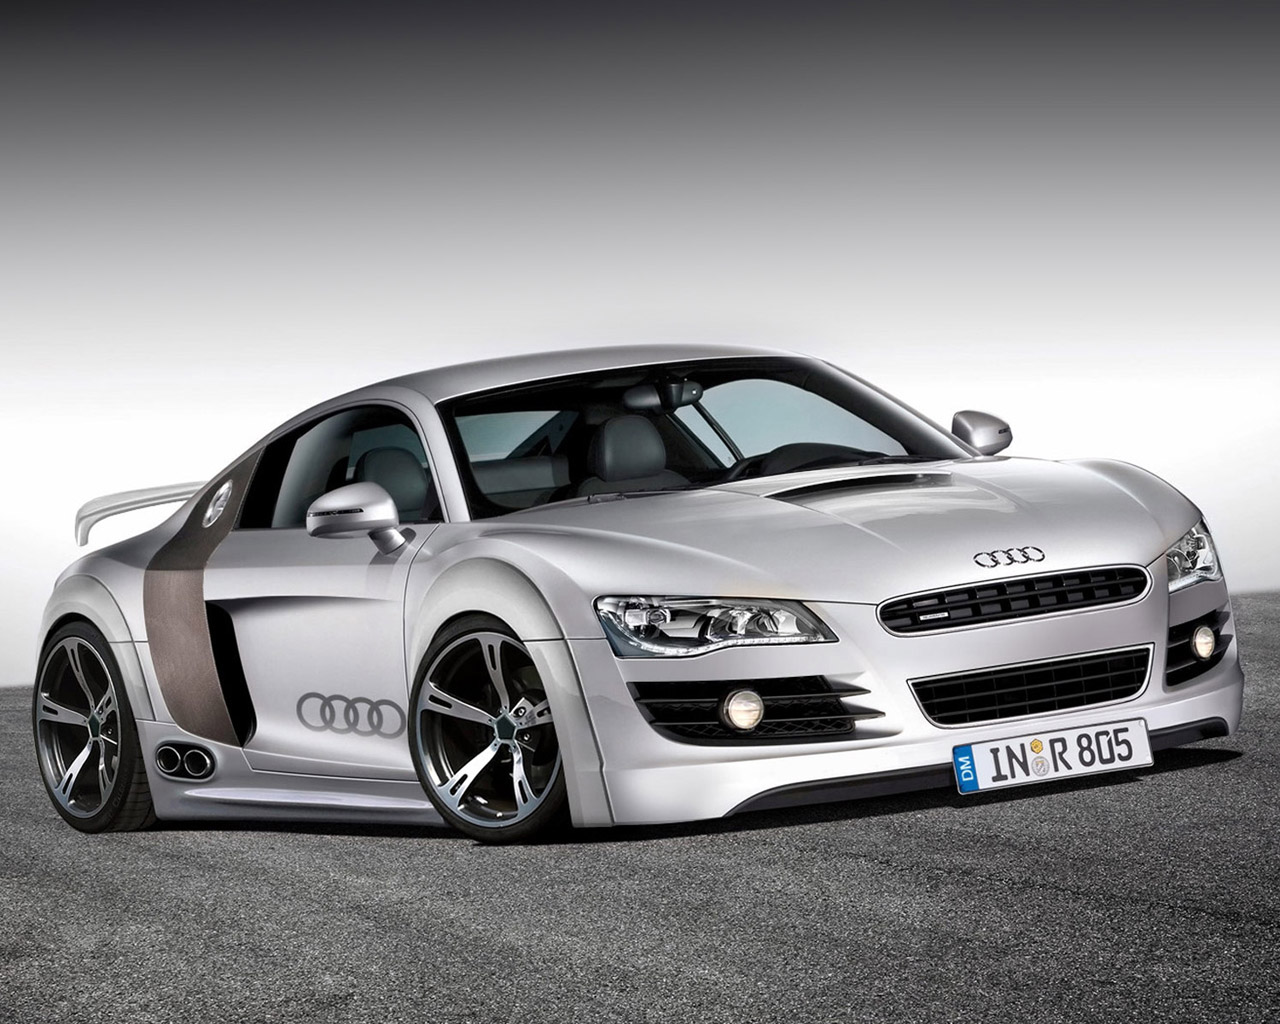 Sport Cars Hi Speed Hd For Desktop Racing High 280815 Wallpaper wallpaper